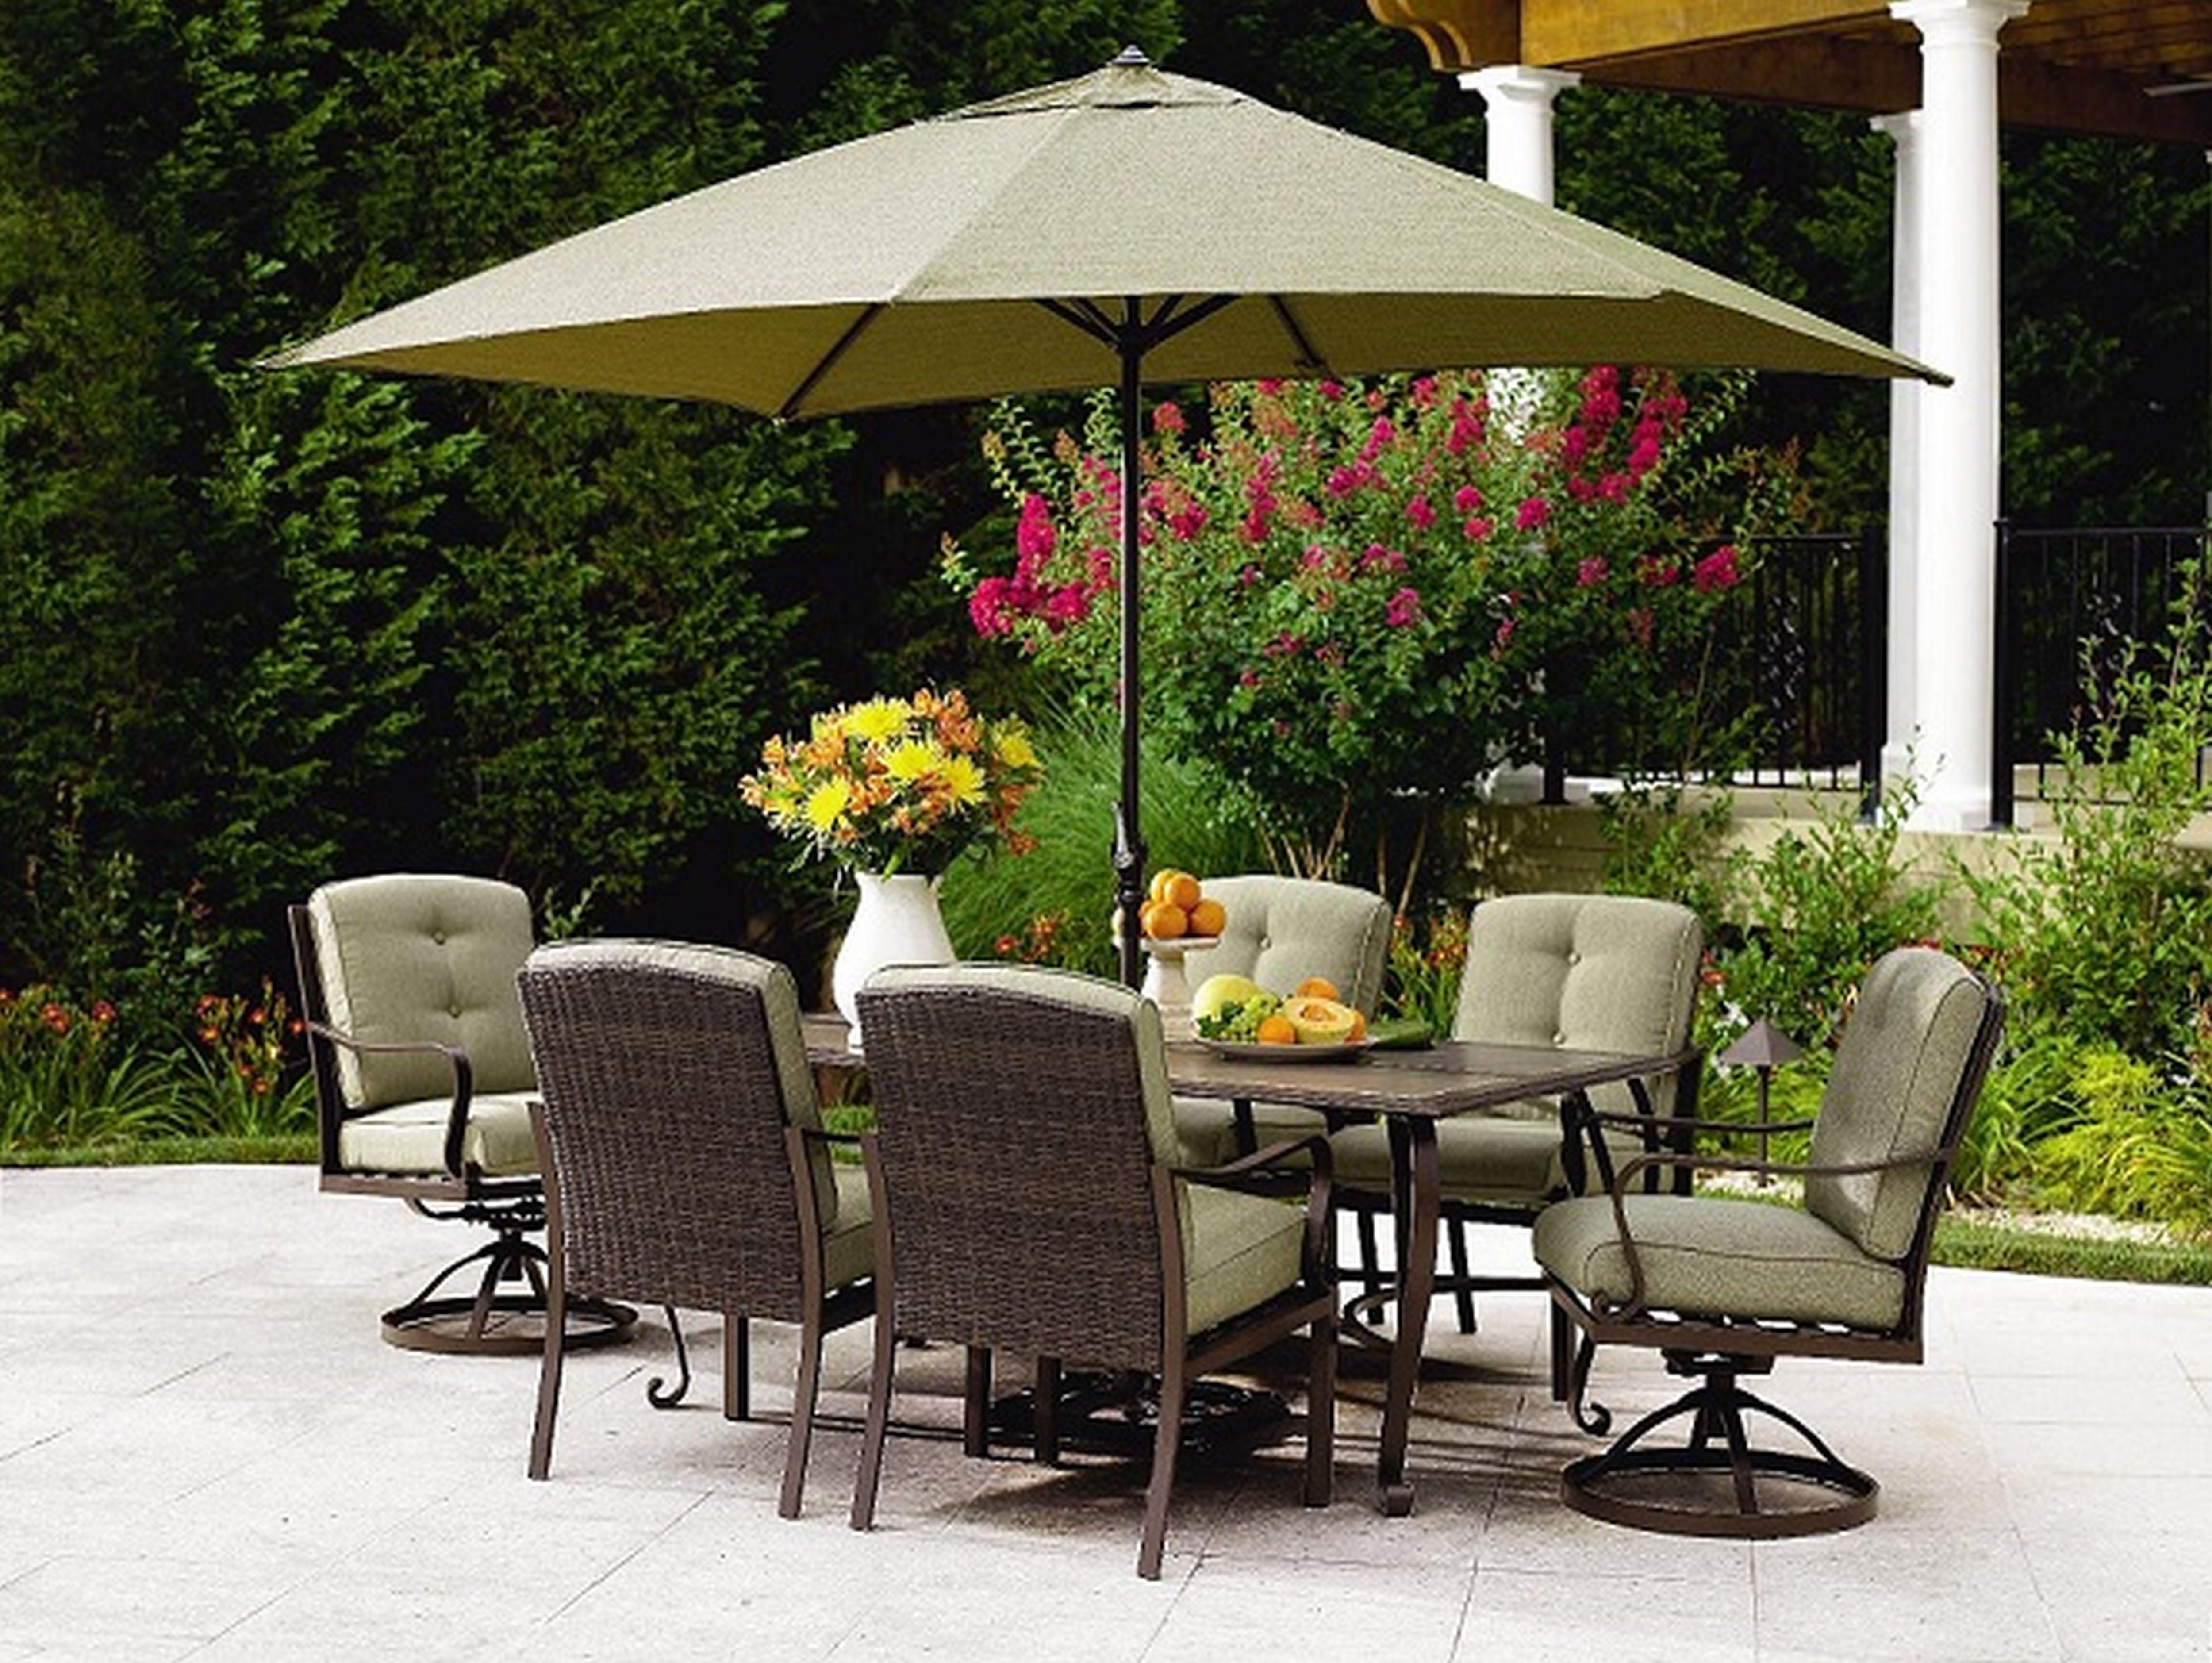 Patio Table Set With Umbrella Furniture Ideas